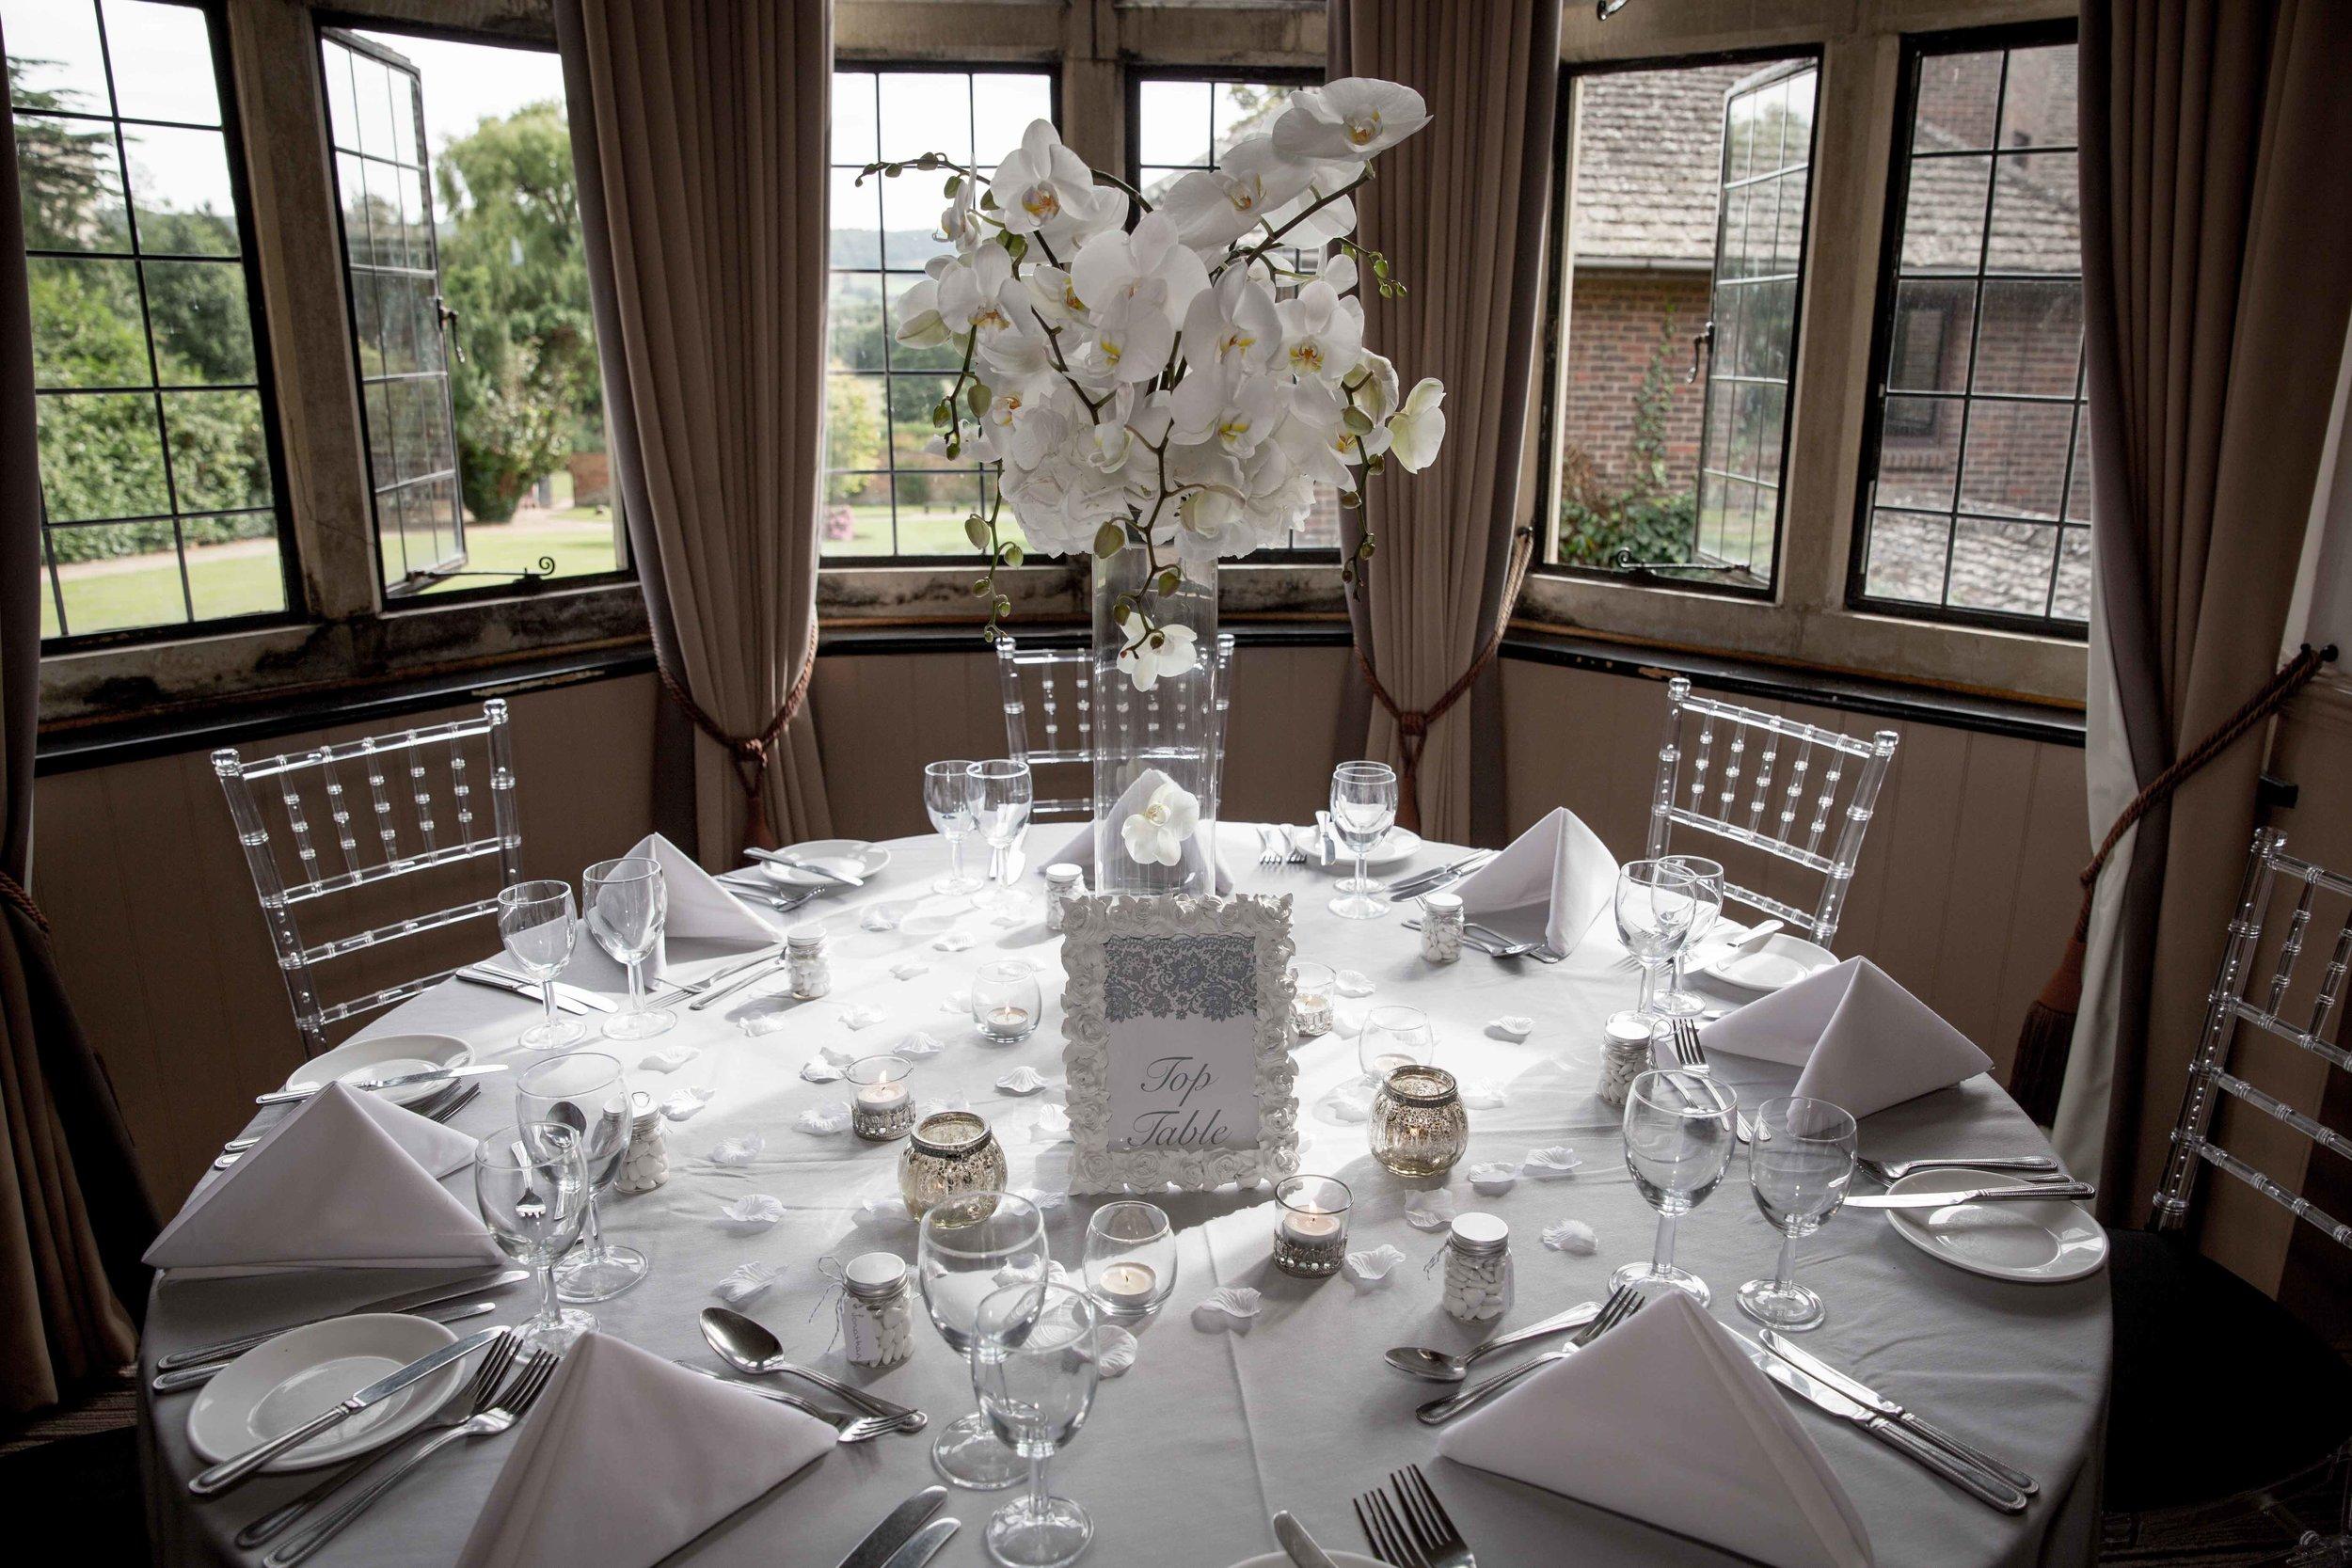 cotswold-wedding-photography-at-stonehouse-court-hotel-natalia-smith-photography-gloucestershire-wedding-photographer-71.jpg